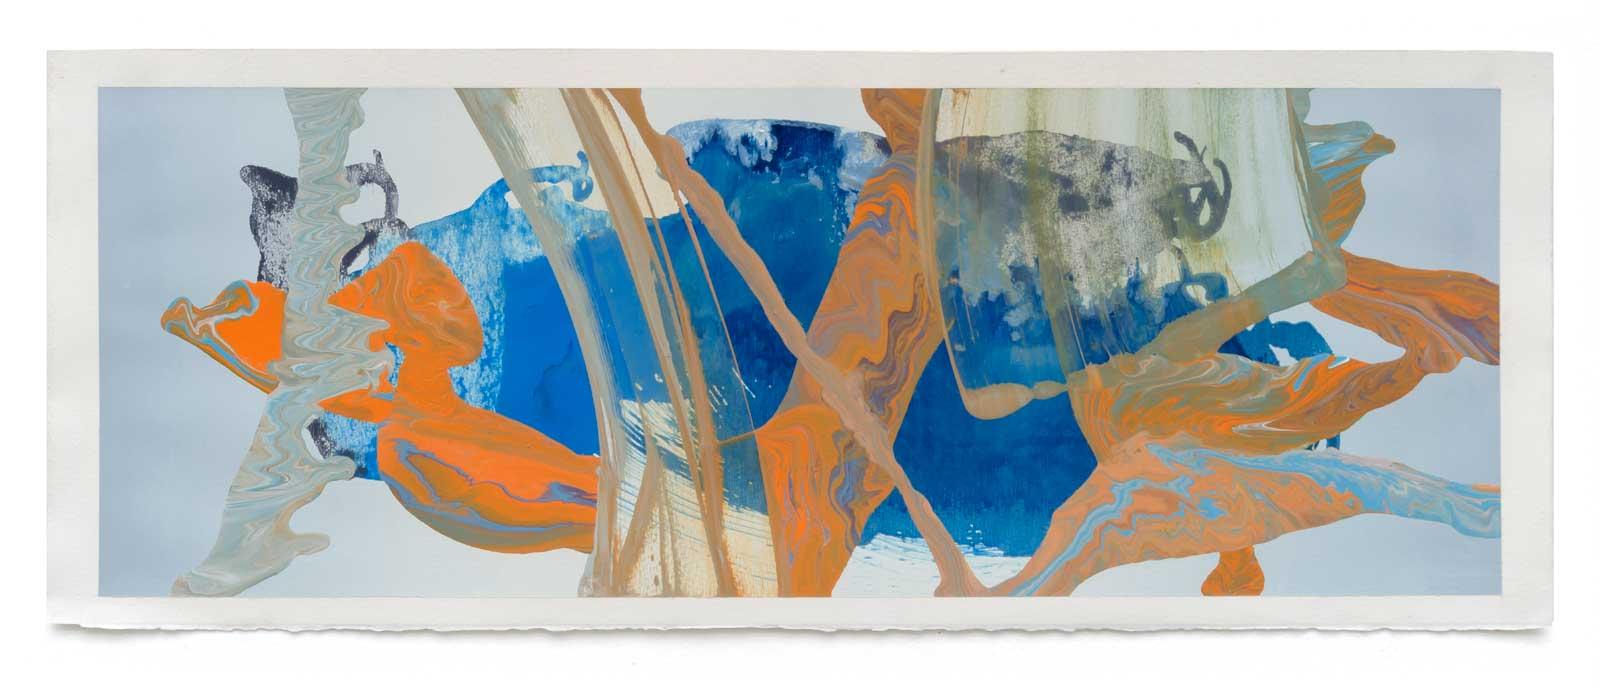 Disruptions-4-oil-on-paper-25.4 cm x 71.12 cm.